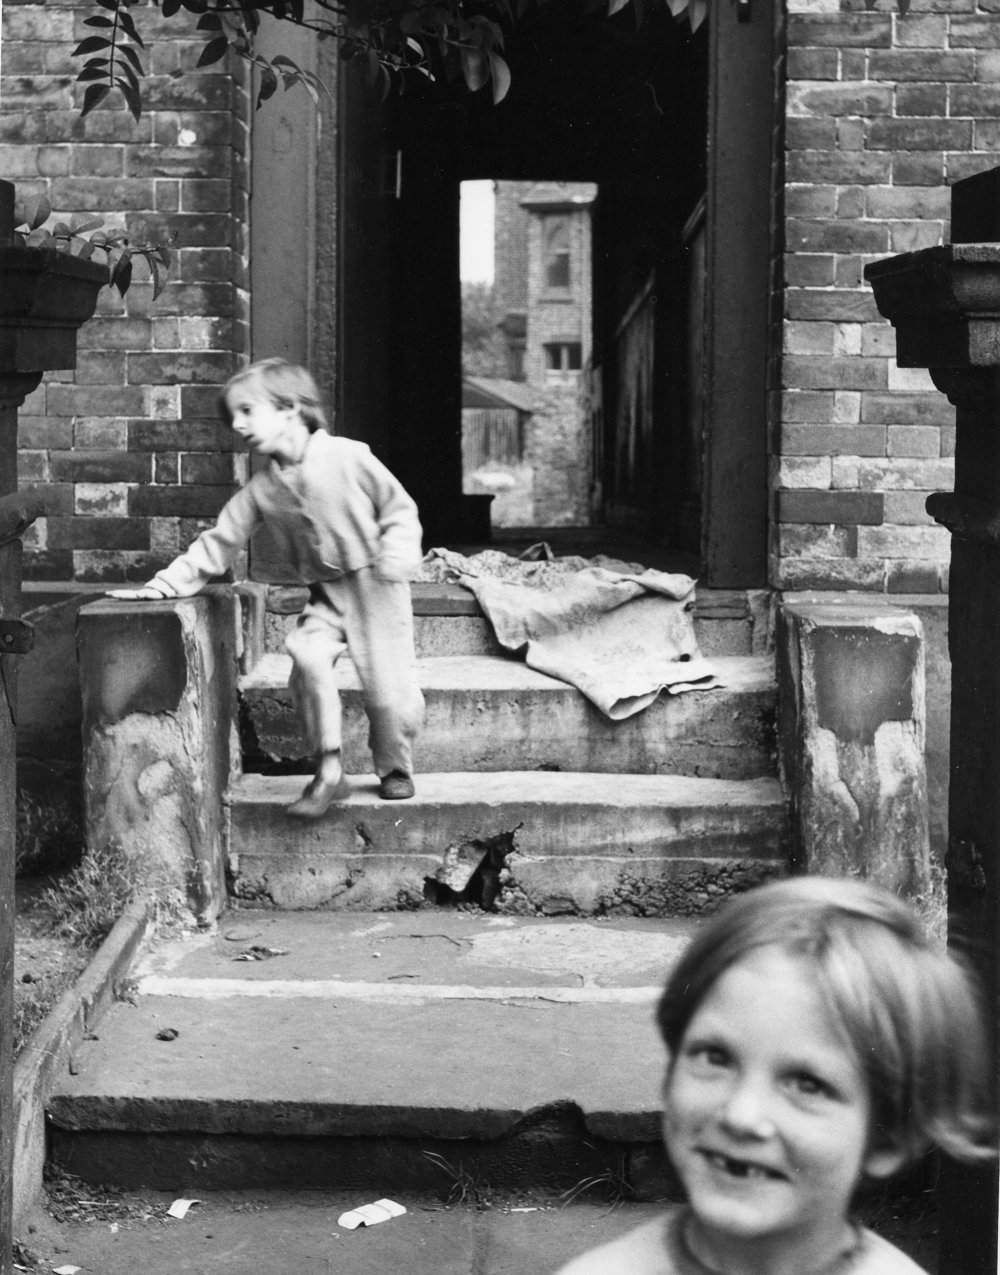 Cheetham, mcr., 2 kids & house, 18-68-5 (1966).jpg